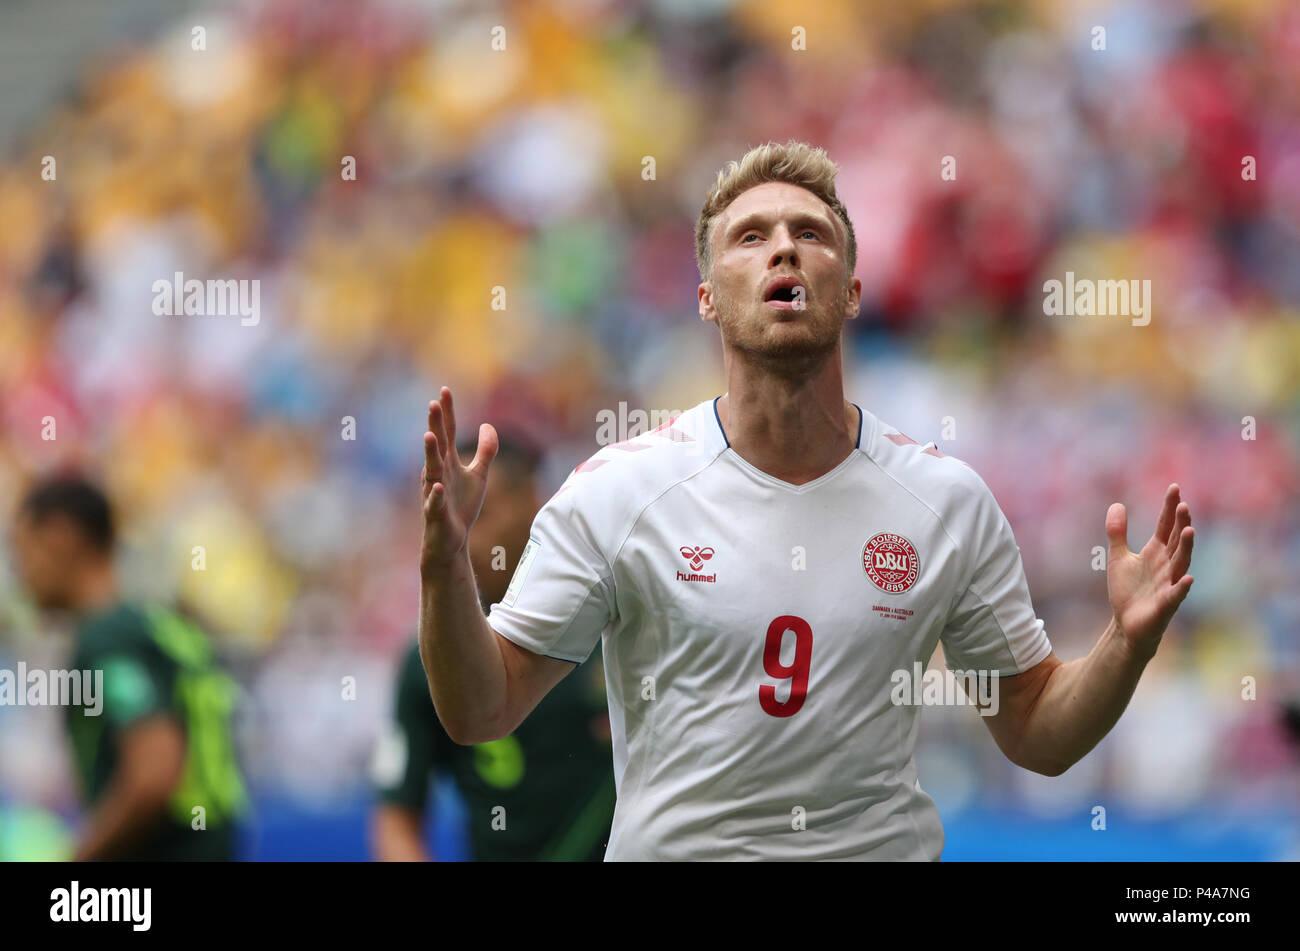 Samara, Russia. 21st June, 2018. Nicolai Jorgensen of Denmark reacts during the 2018 FIFA World Cup Group C match between Denmark and Australia in Samara, Russia, June 21, 2018. Credit: Ye Pingfan/Xinhua/Alamy Live News - Stock Image